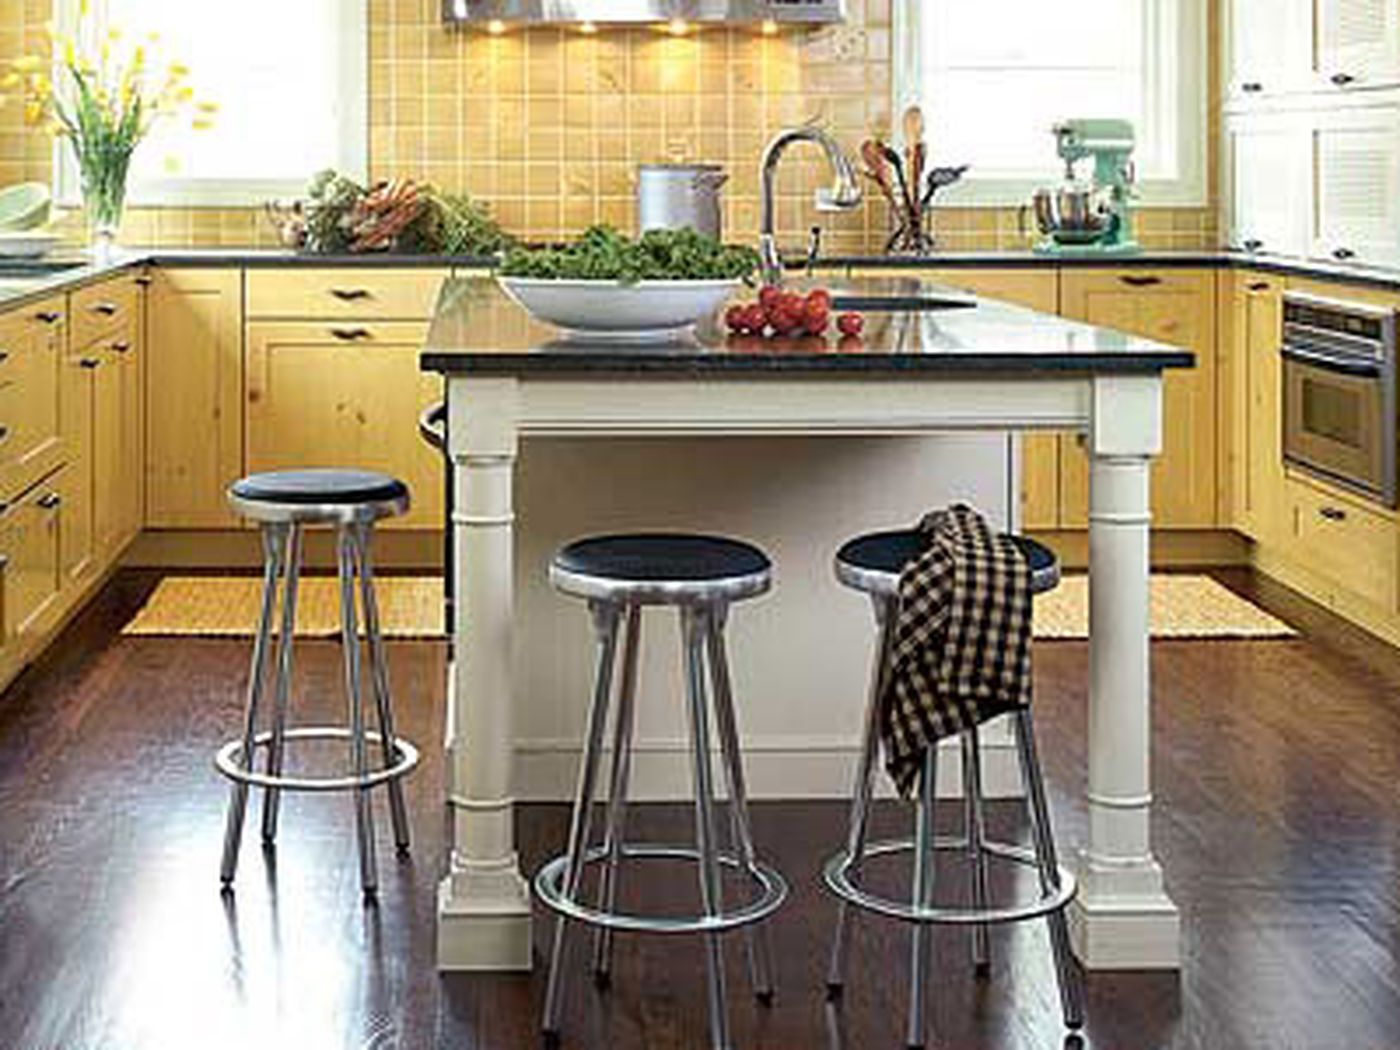 Kitchen Island Design Ideas This Old House